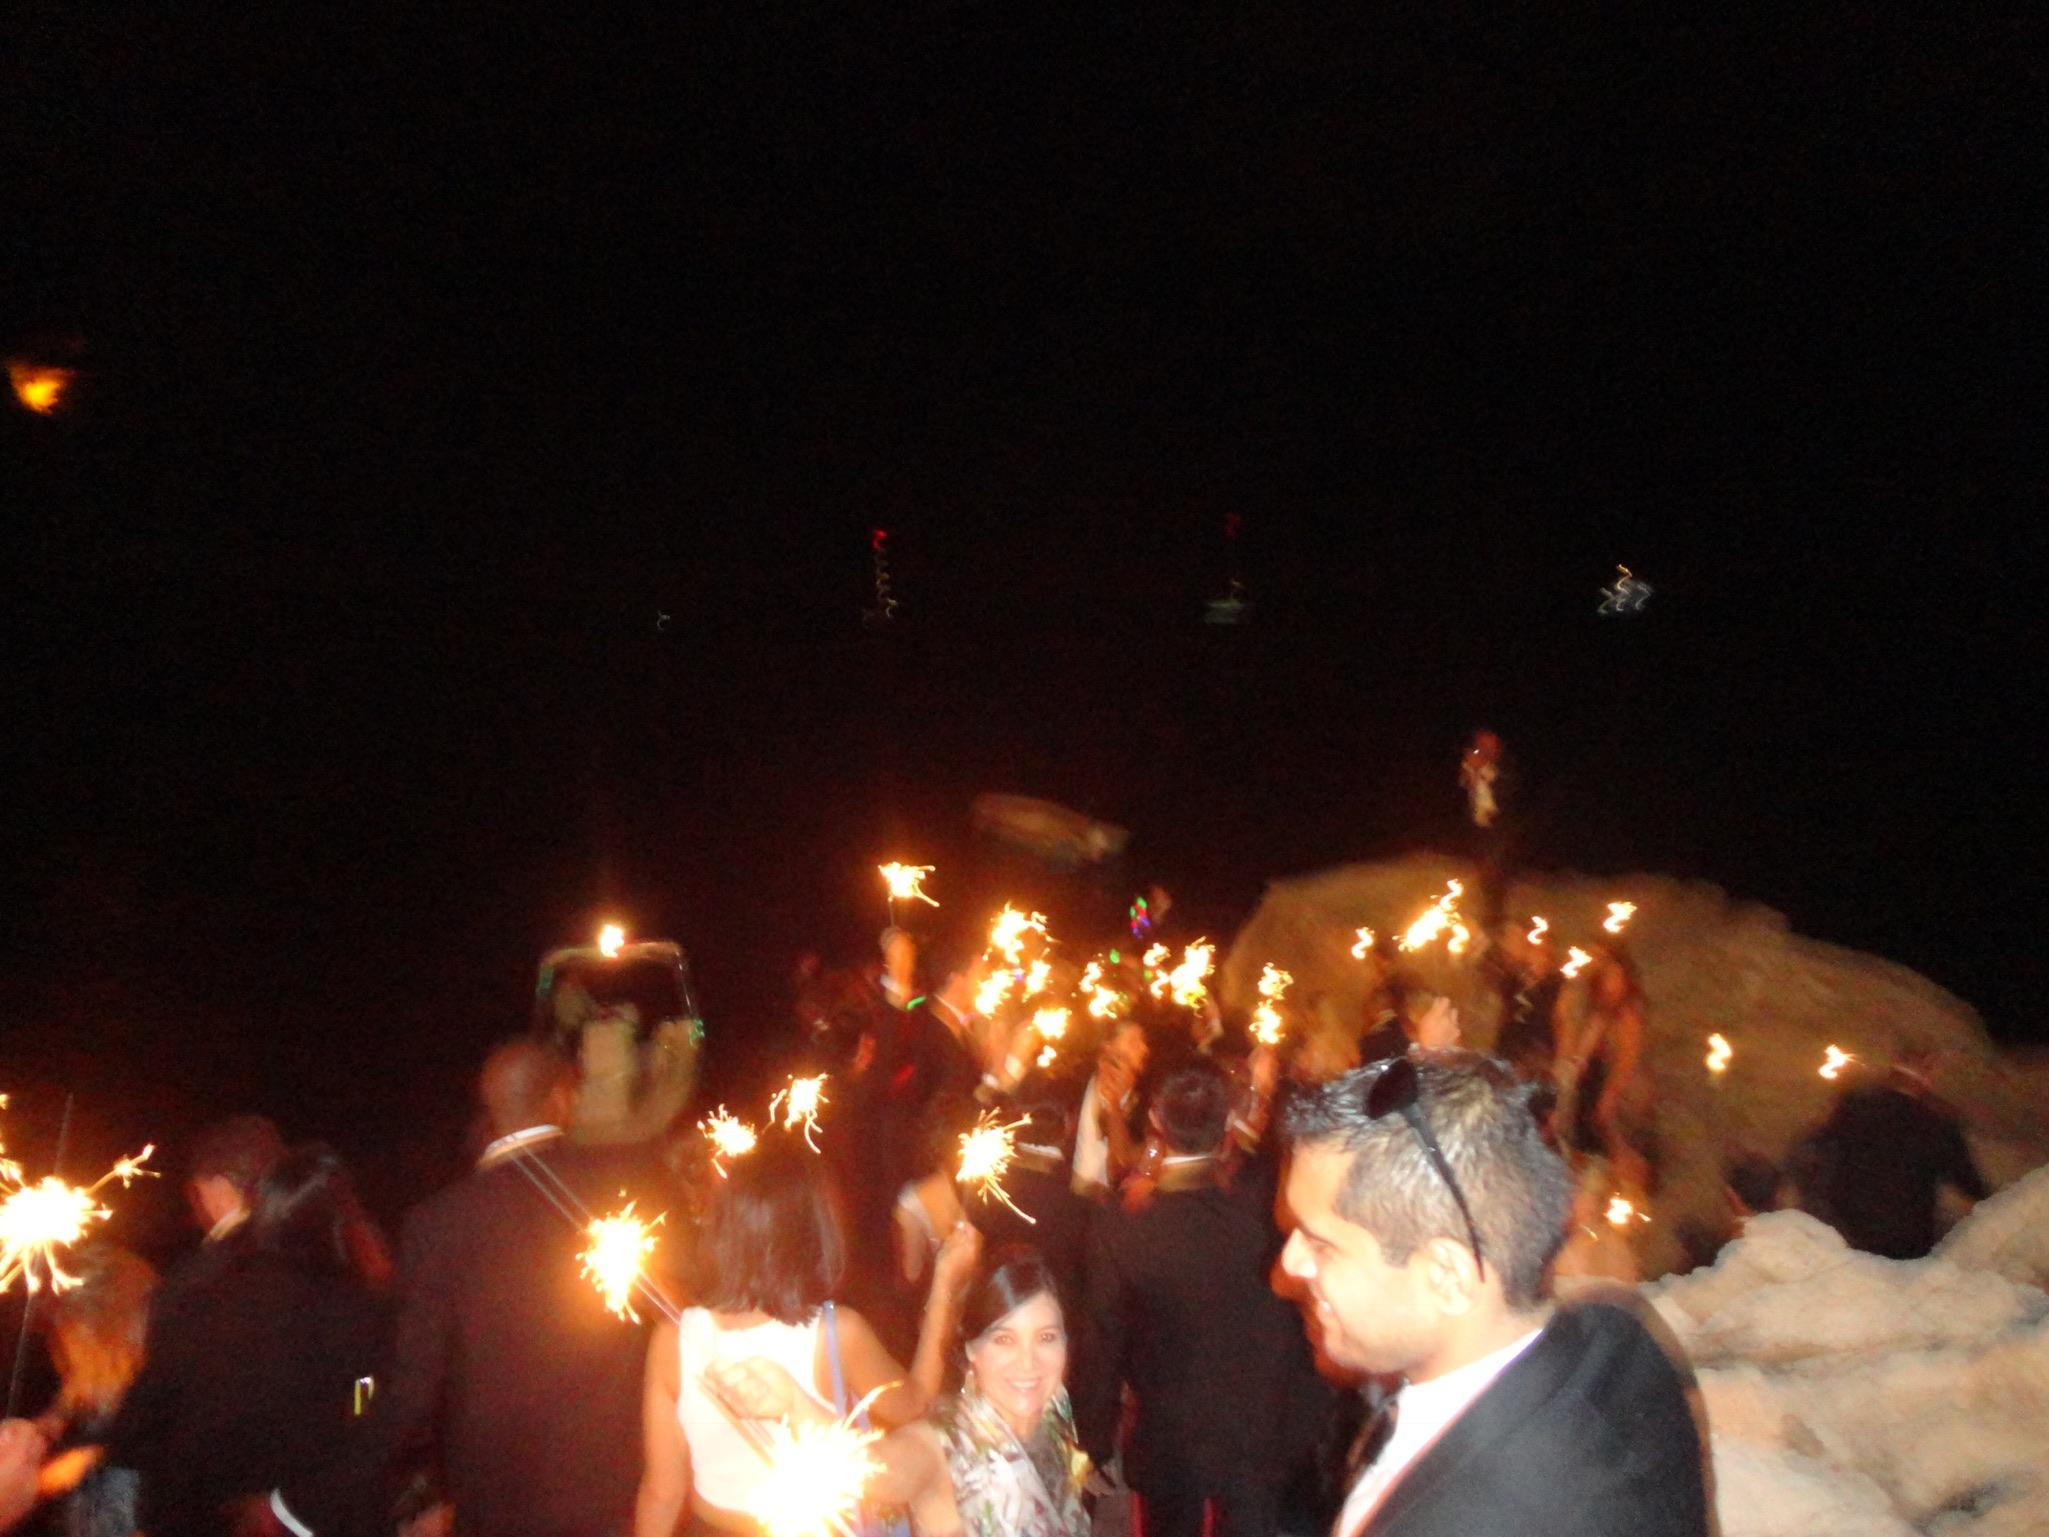 https://www.weddingamalfi.com/wp-content/uploads/Nathalie-and-Benjamin-wedding-in-Positano-24.jpg